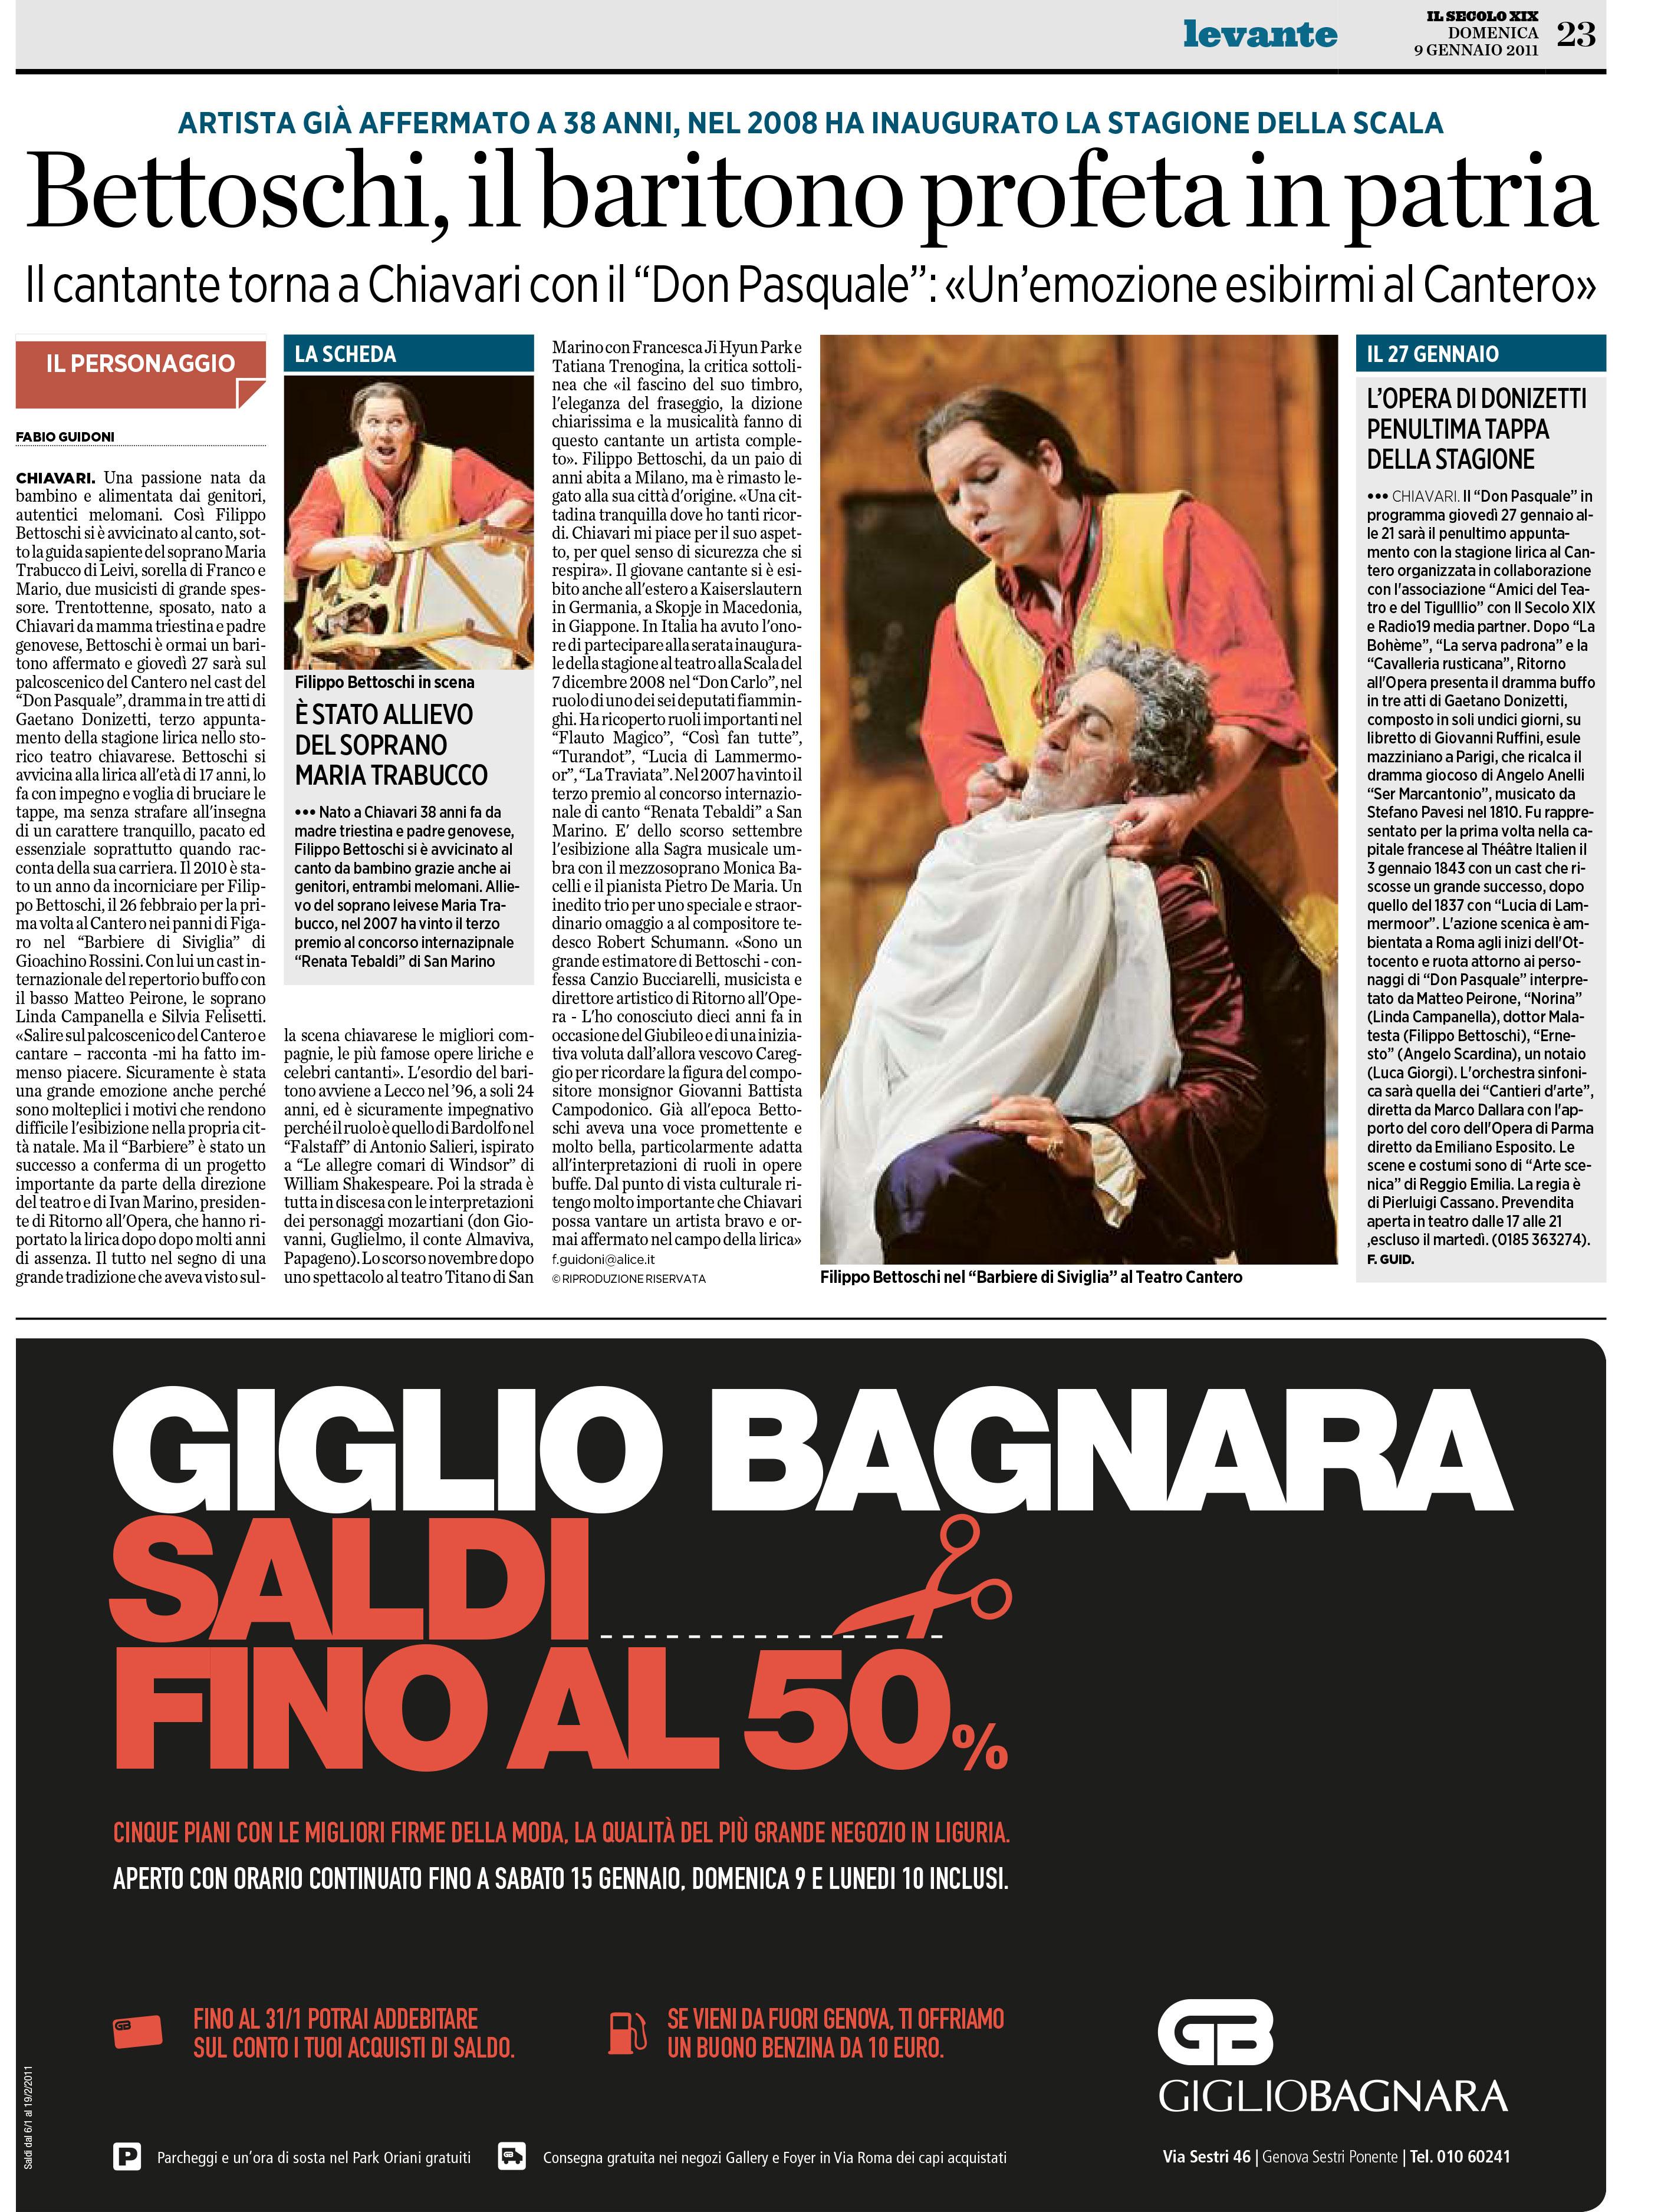 09.01.2011 – IL SECOLO XIX – Don Pasquale